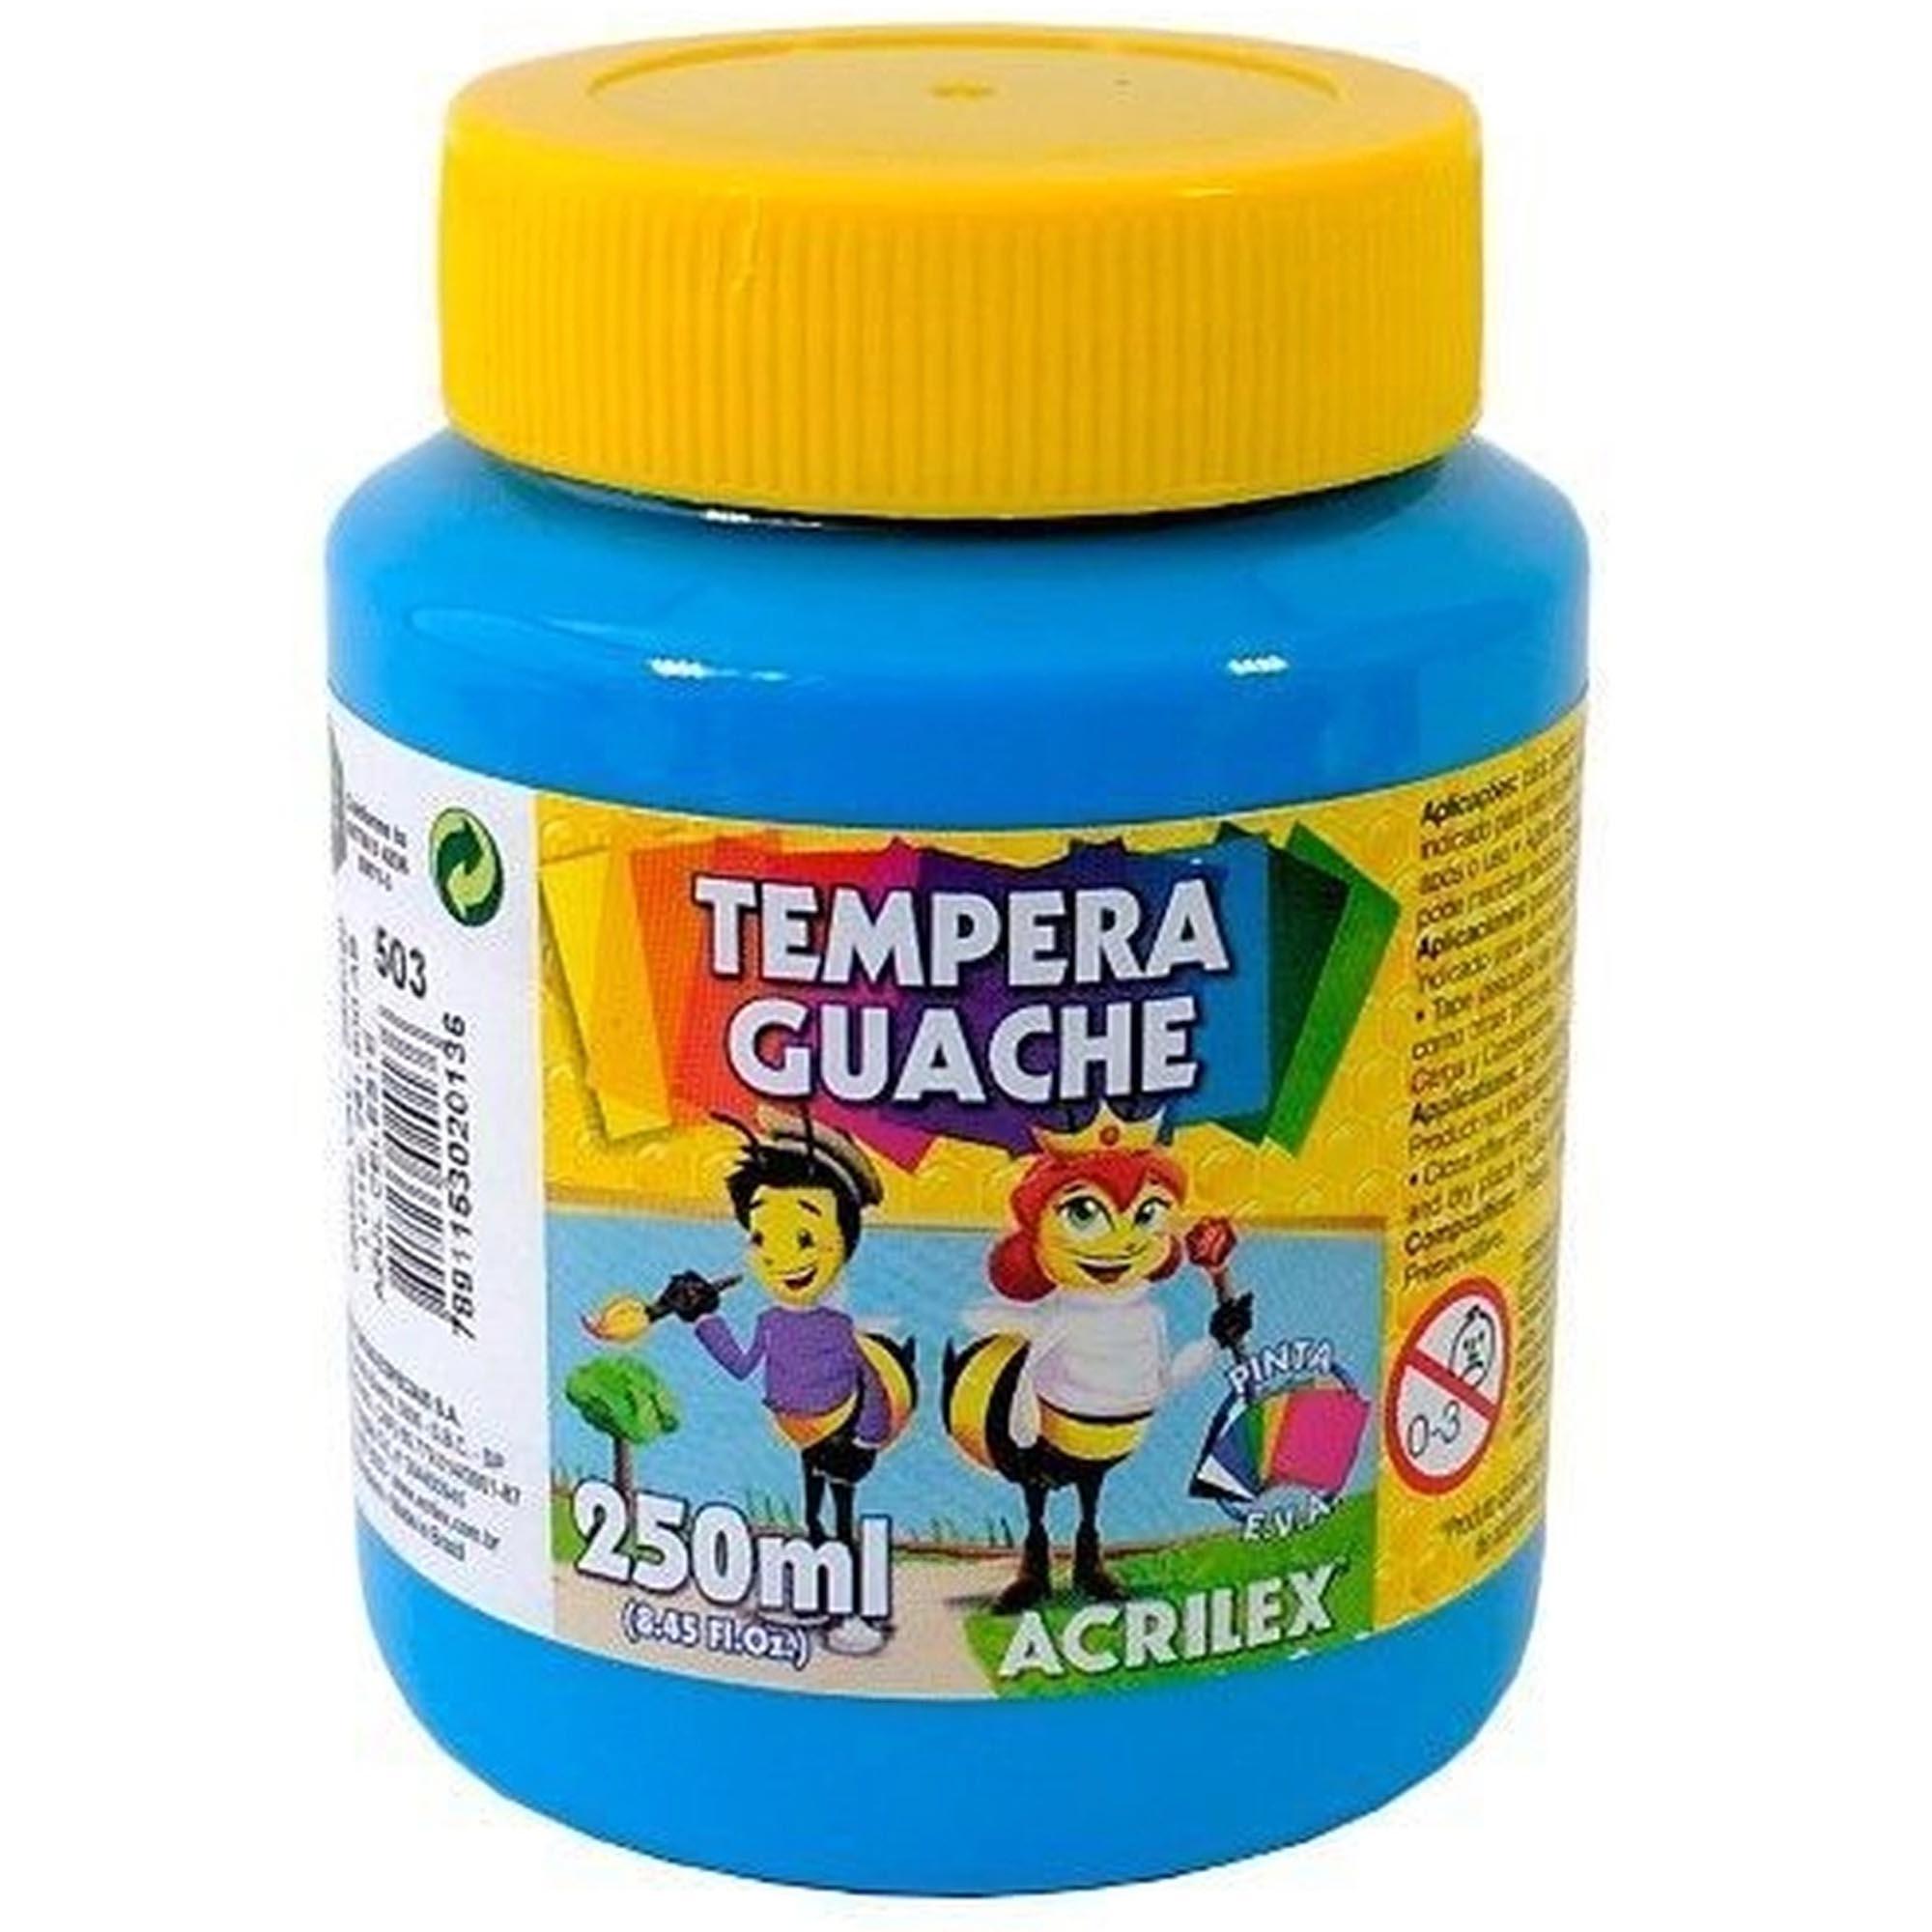 TEMPERA GUACHE 250ML - ACRILEX AZUL CELESTE